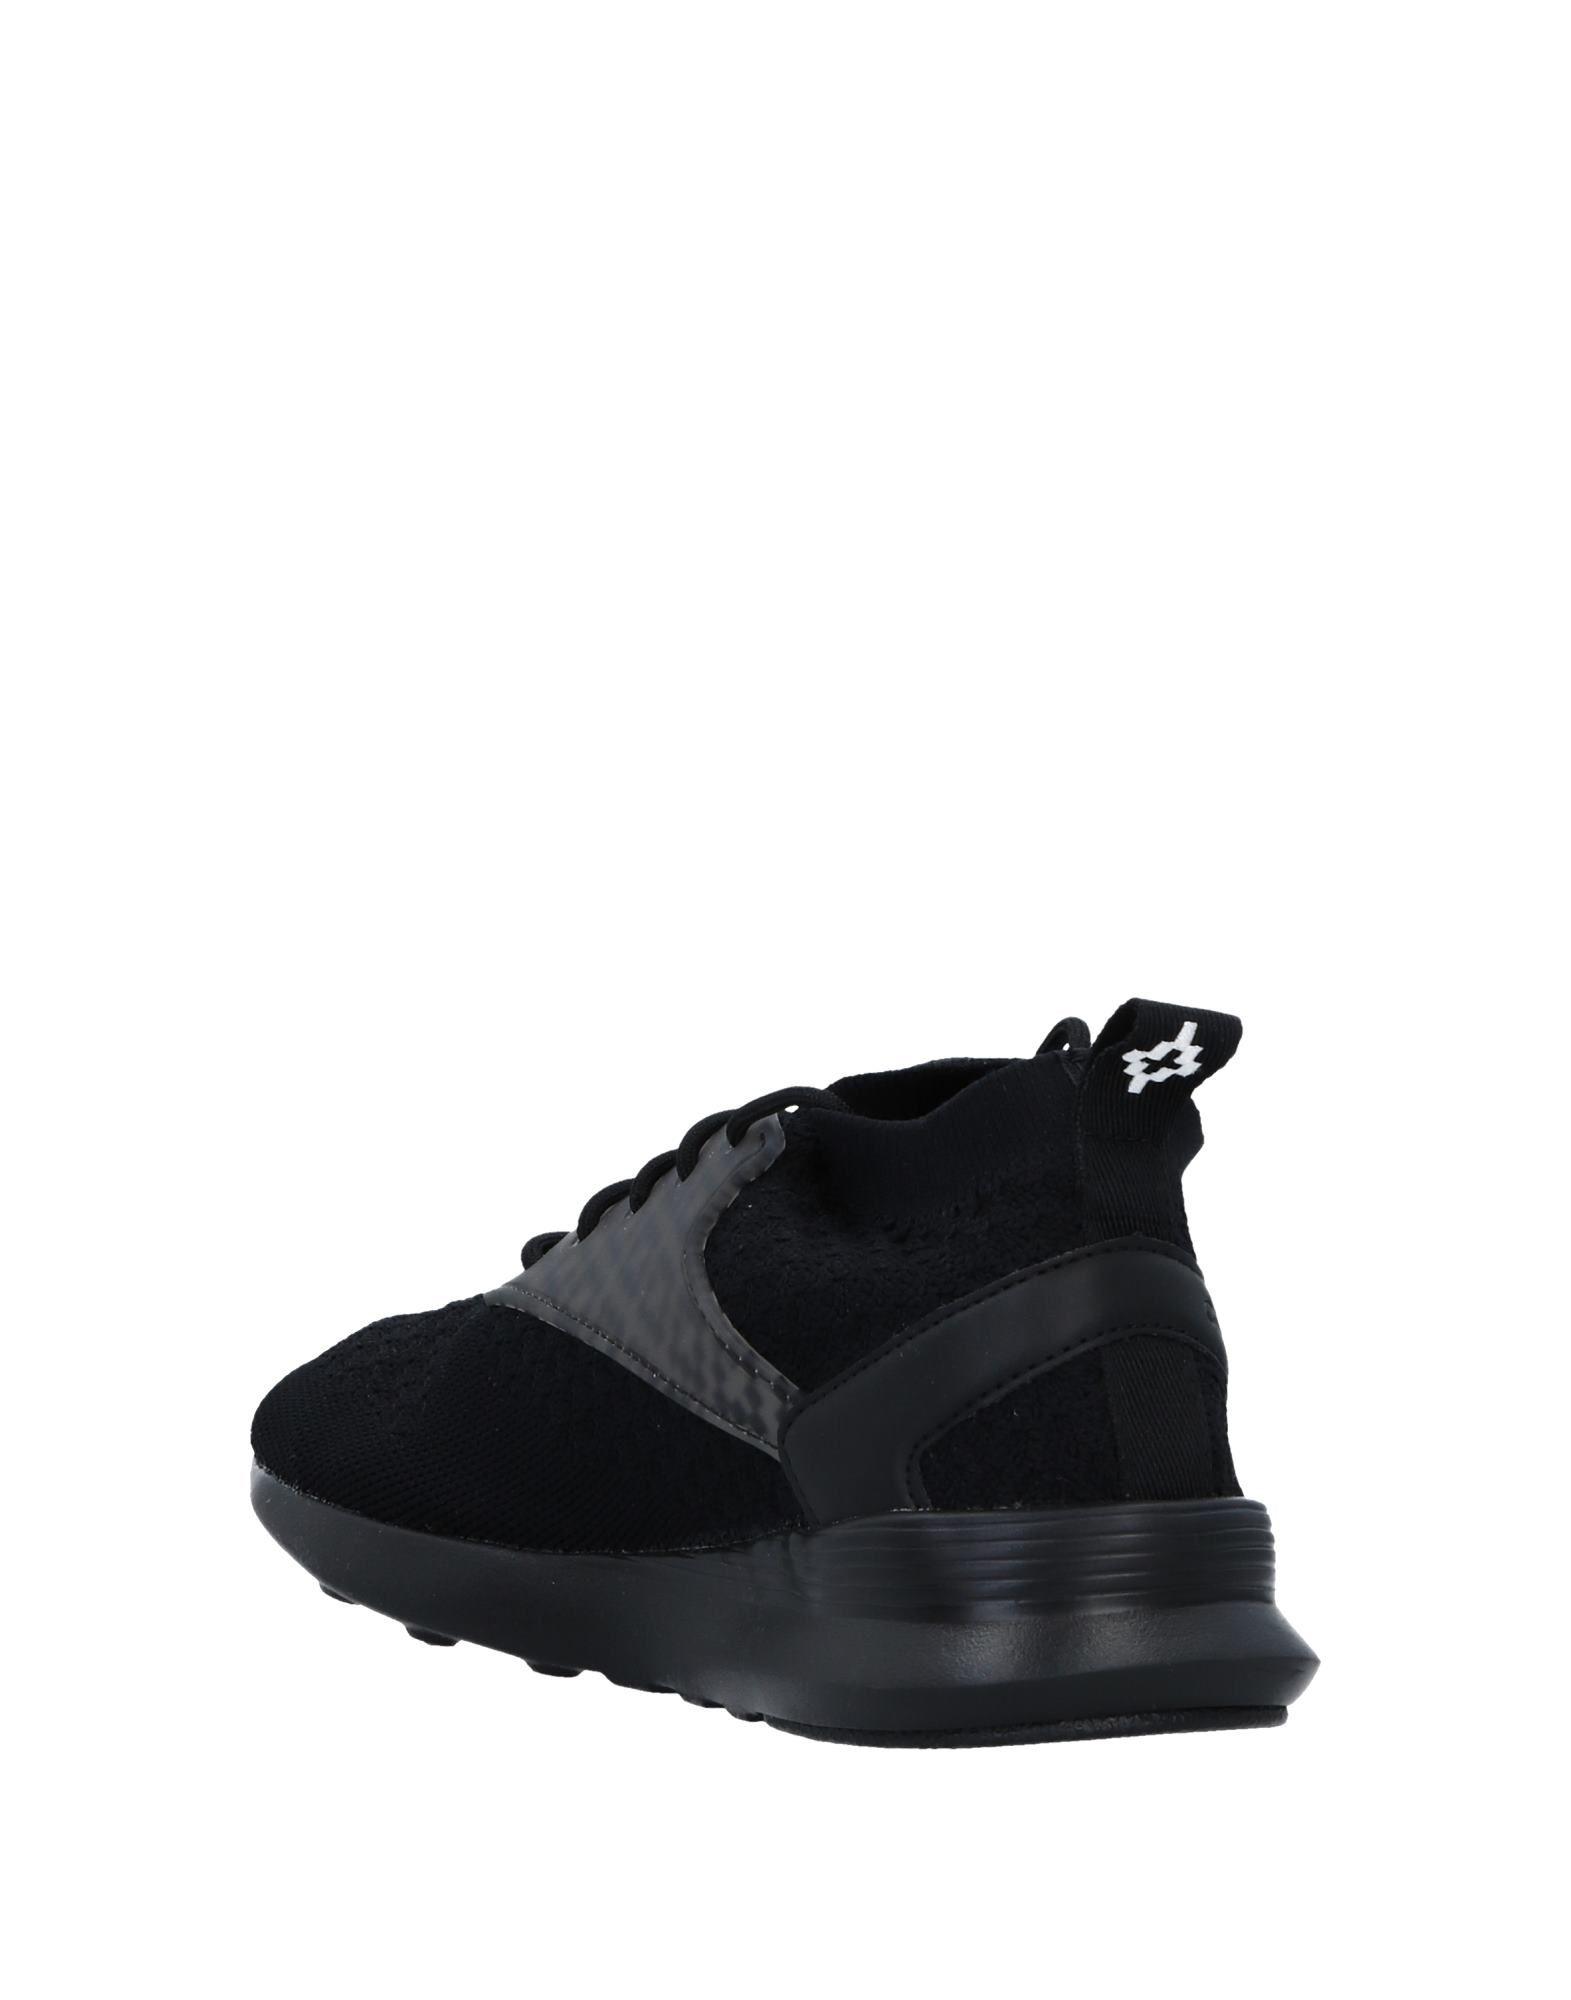 Reebok Sneakers Damen Damen Sneakers  11500516OU 887f37